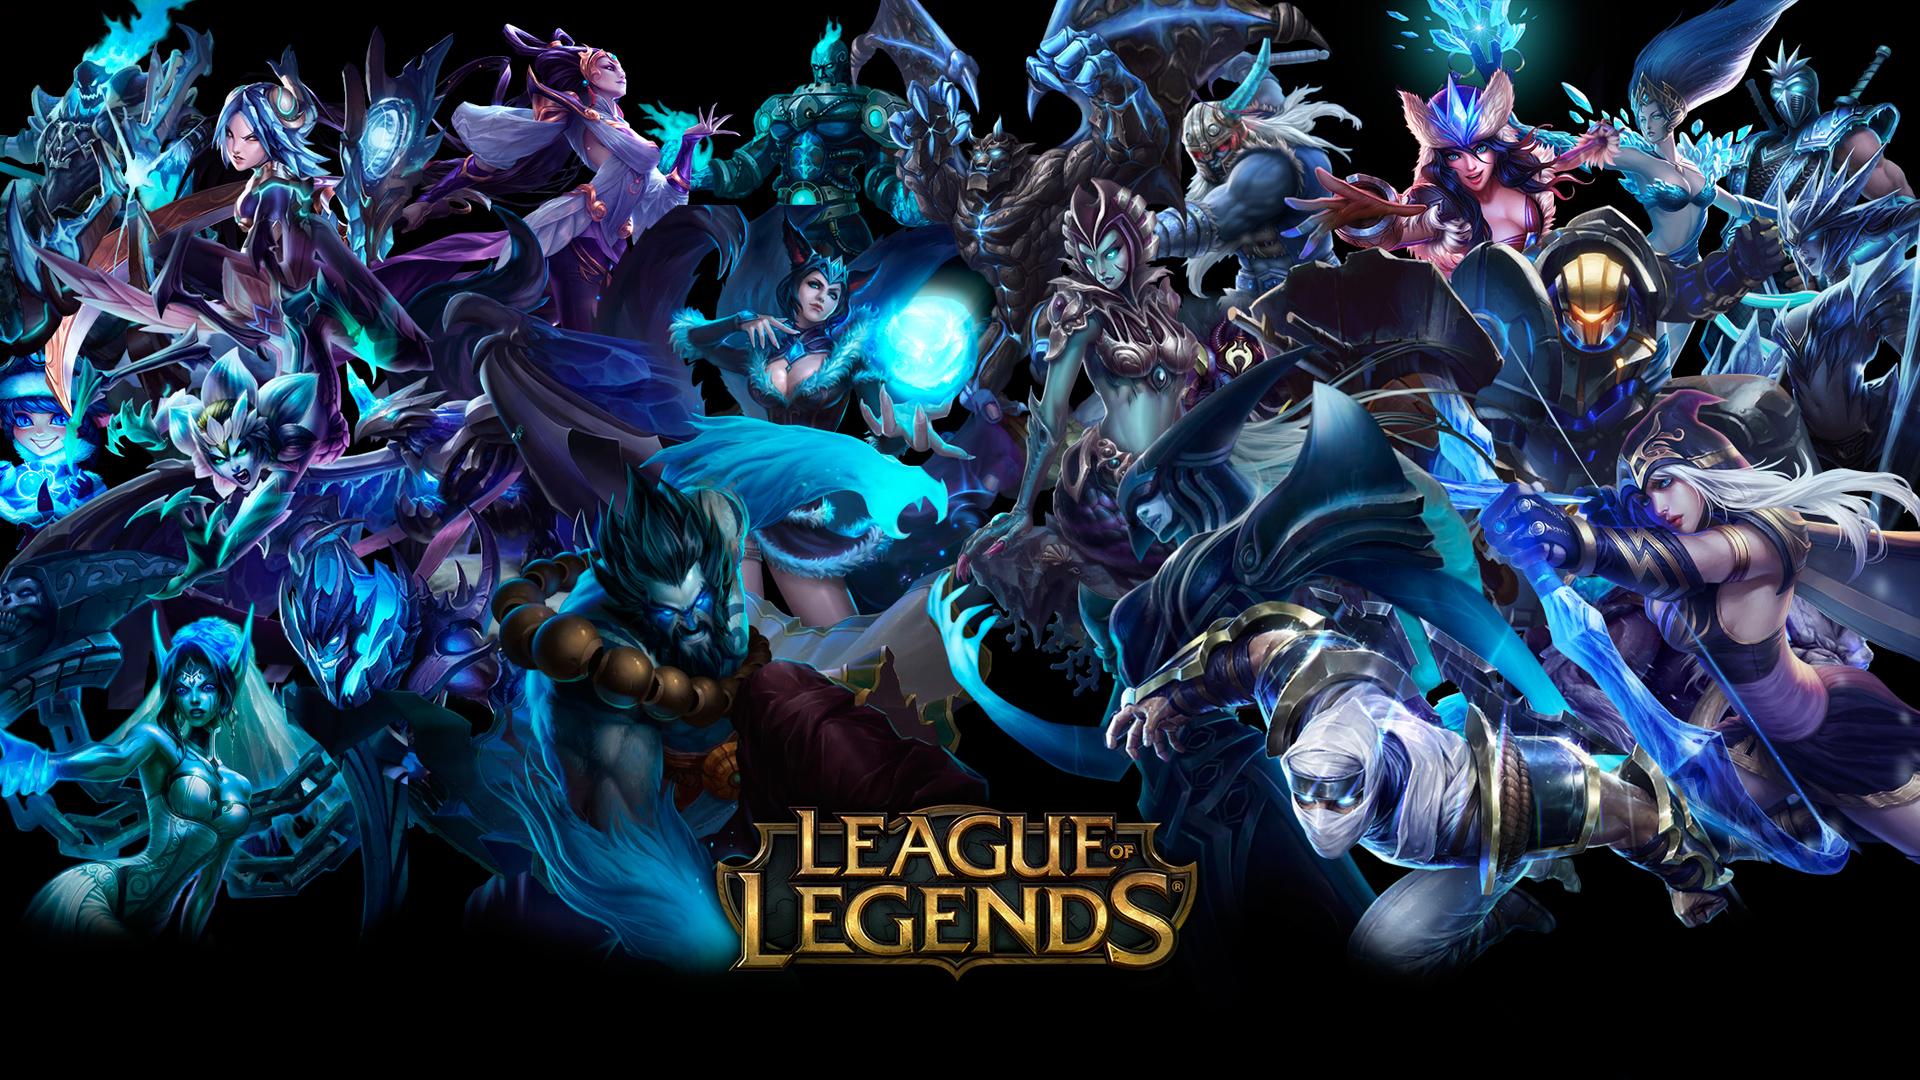 League of Legends Wallpapers Best Wallpapers 1920x1080